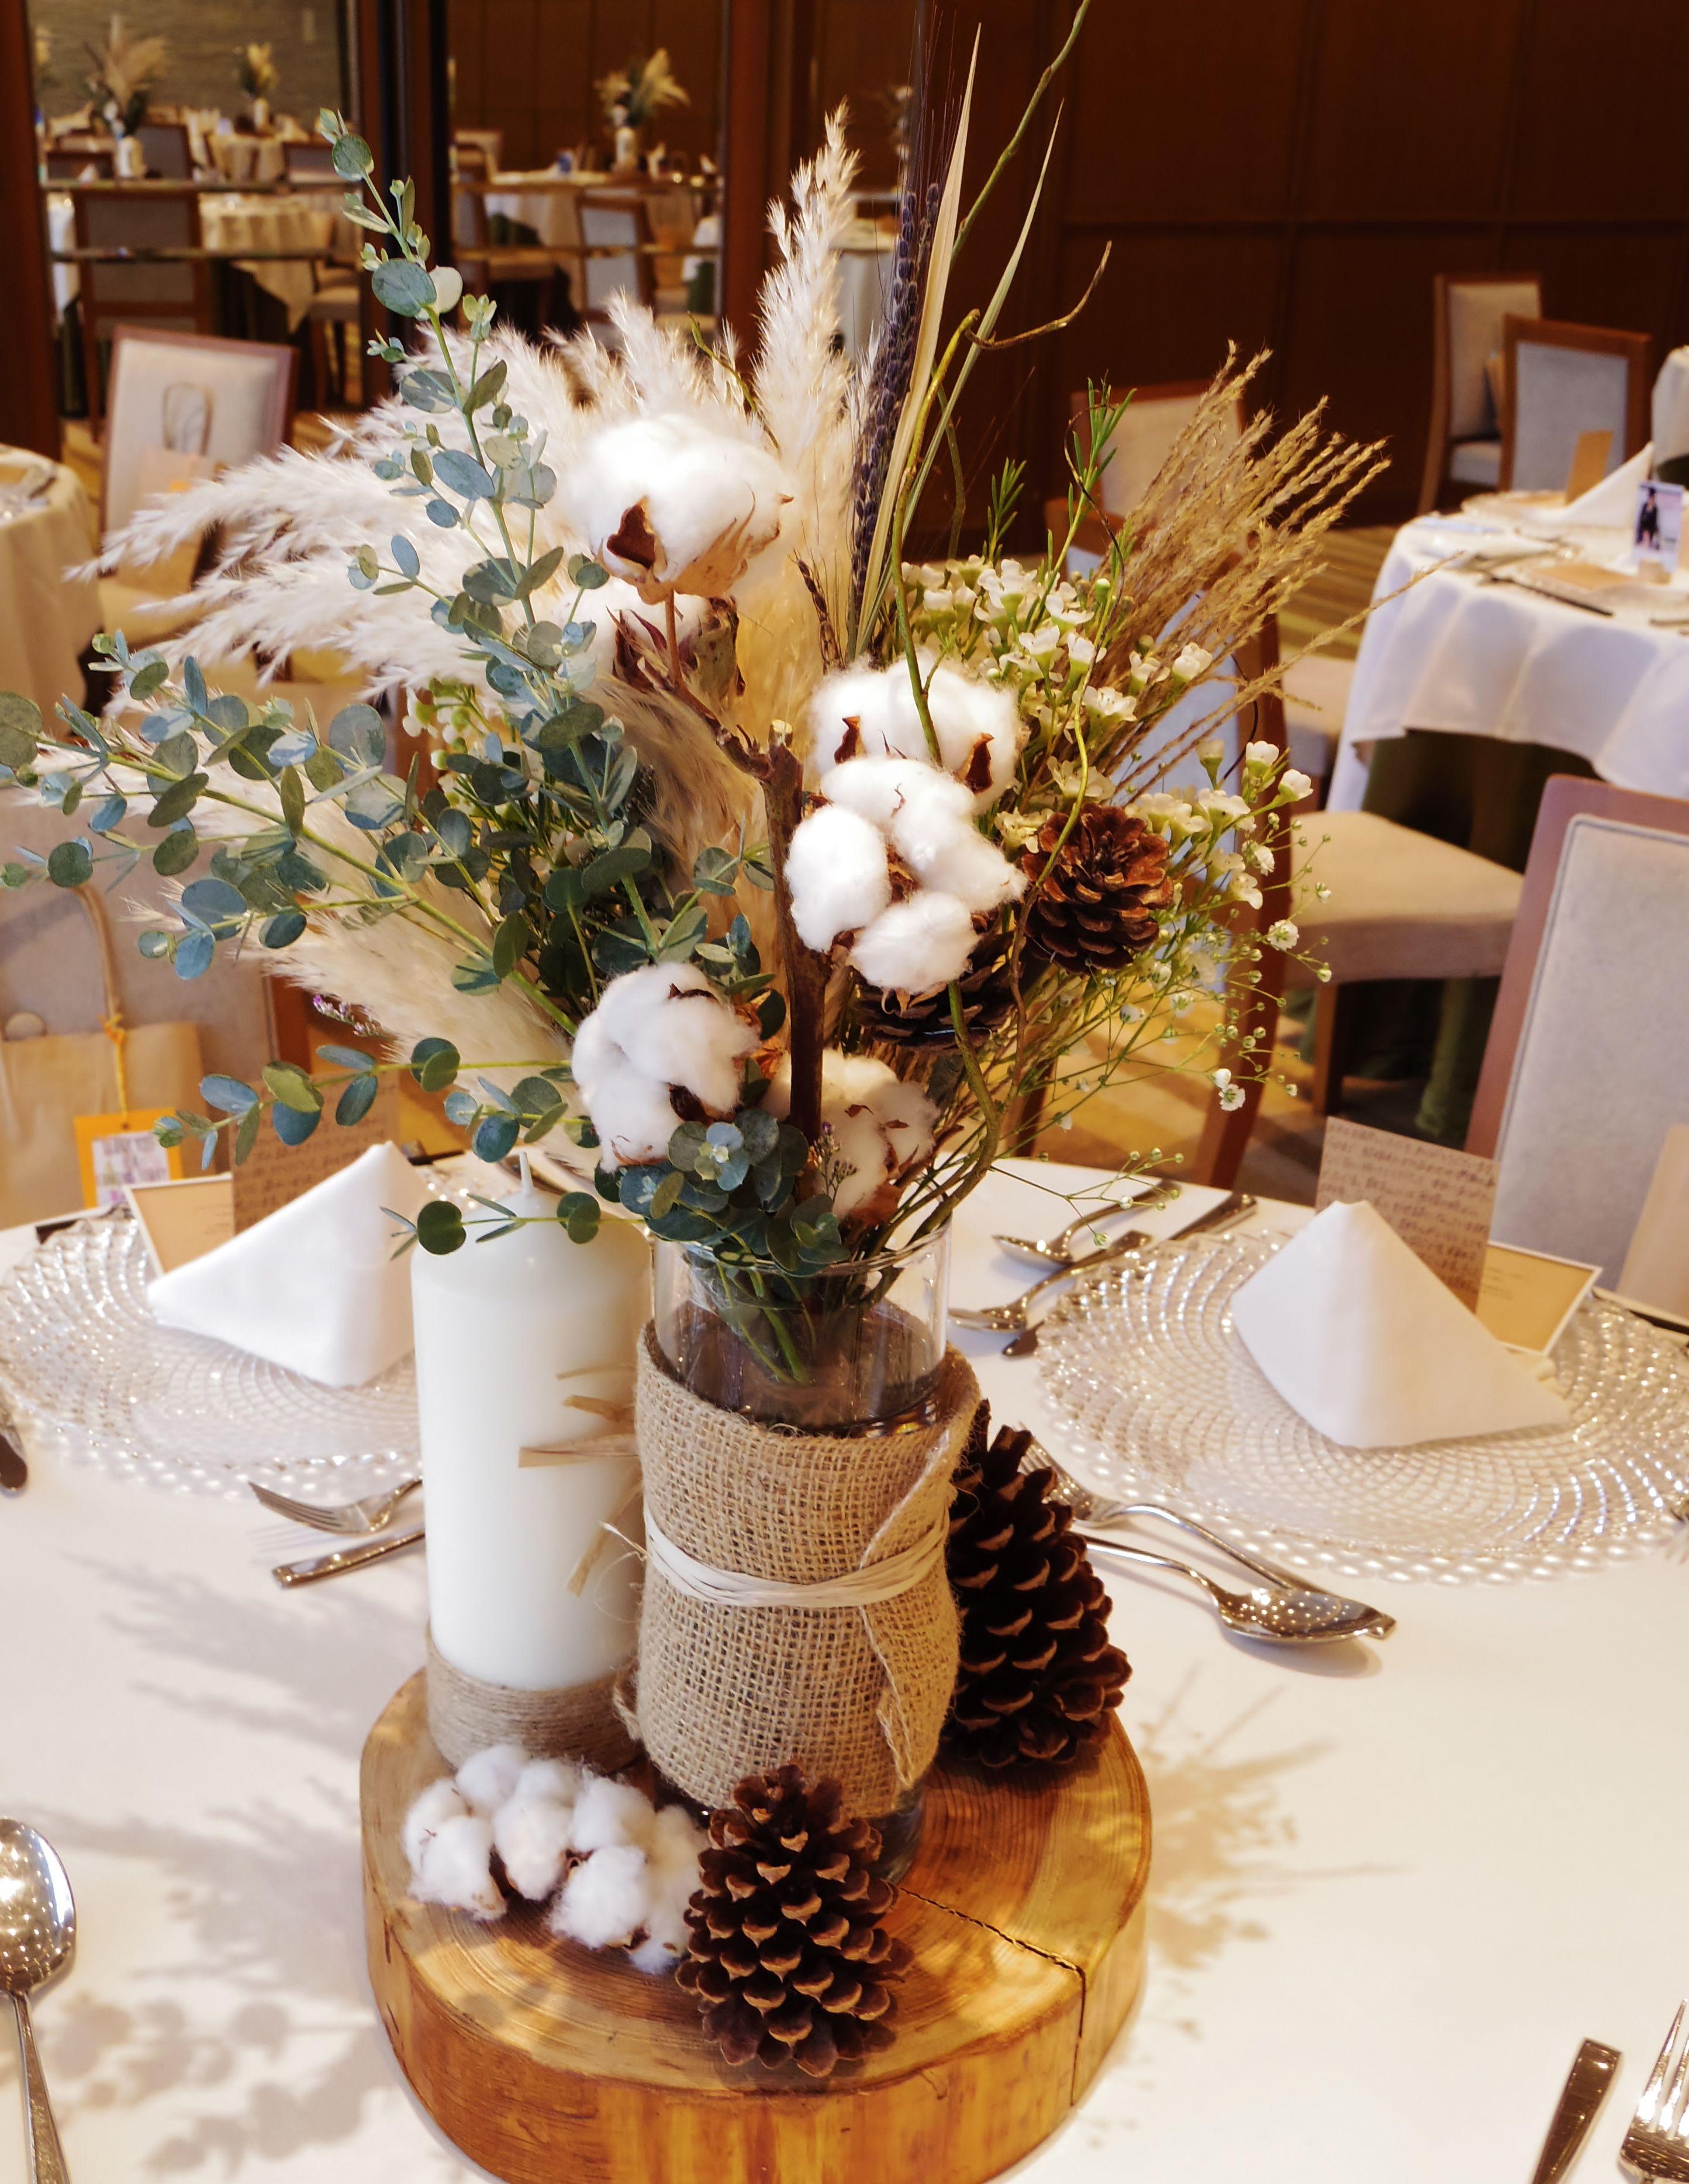 317fbe07ae207  novarese vressetrose  wedding vintage tablecoordinate guesttable natural   flower  bridal amandansail アマンダンセイル ノバレーゼ  ブレスエットロゼ ...